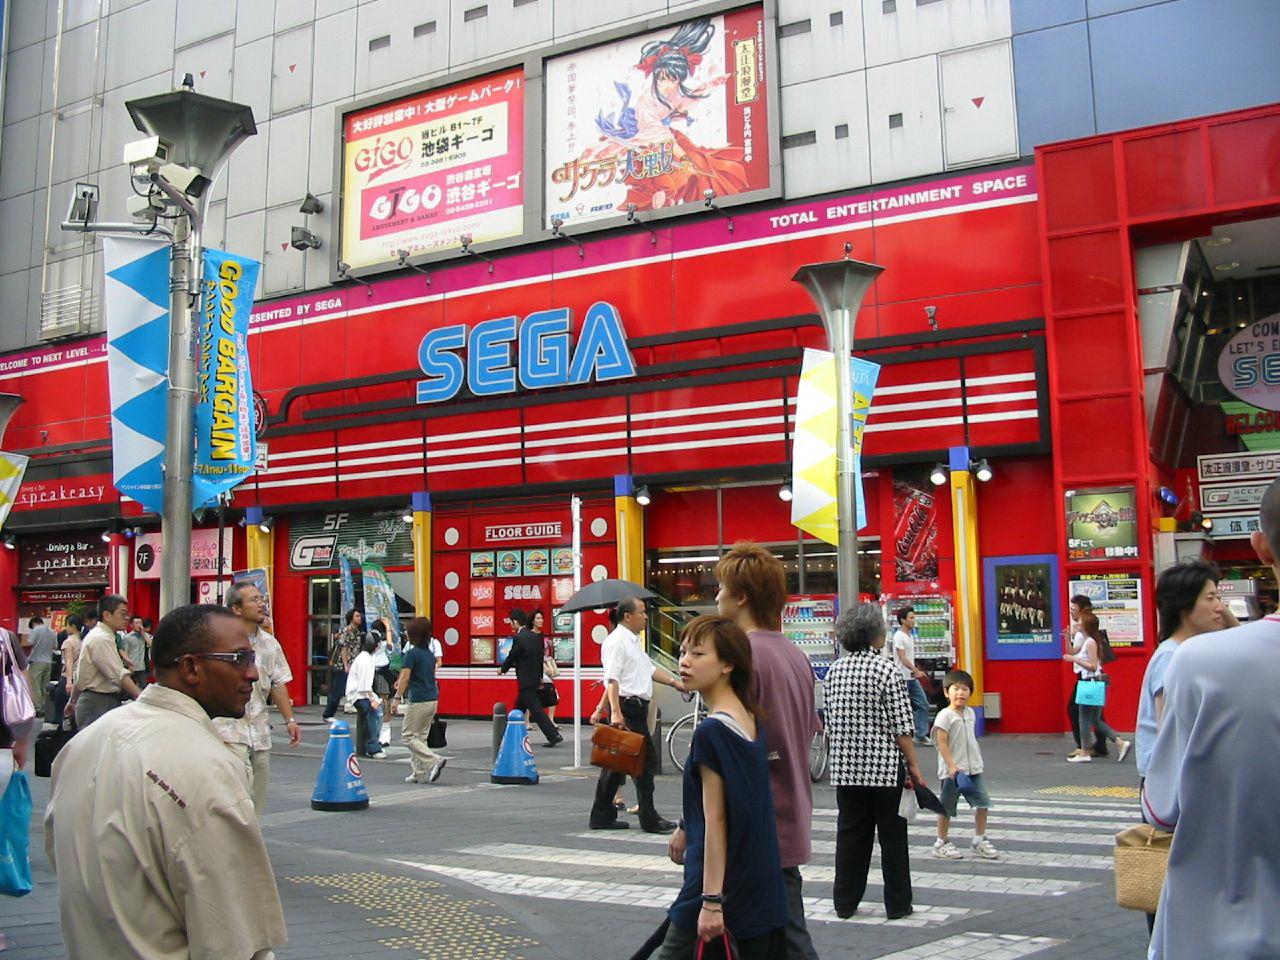 Sega_center_at_ikebukuro_tokyo